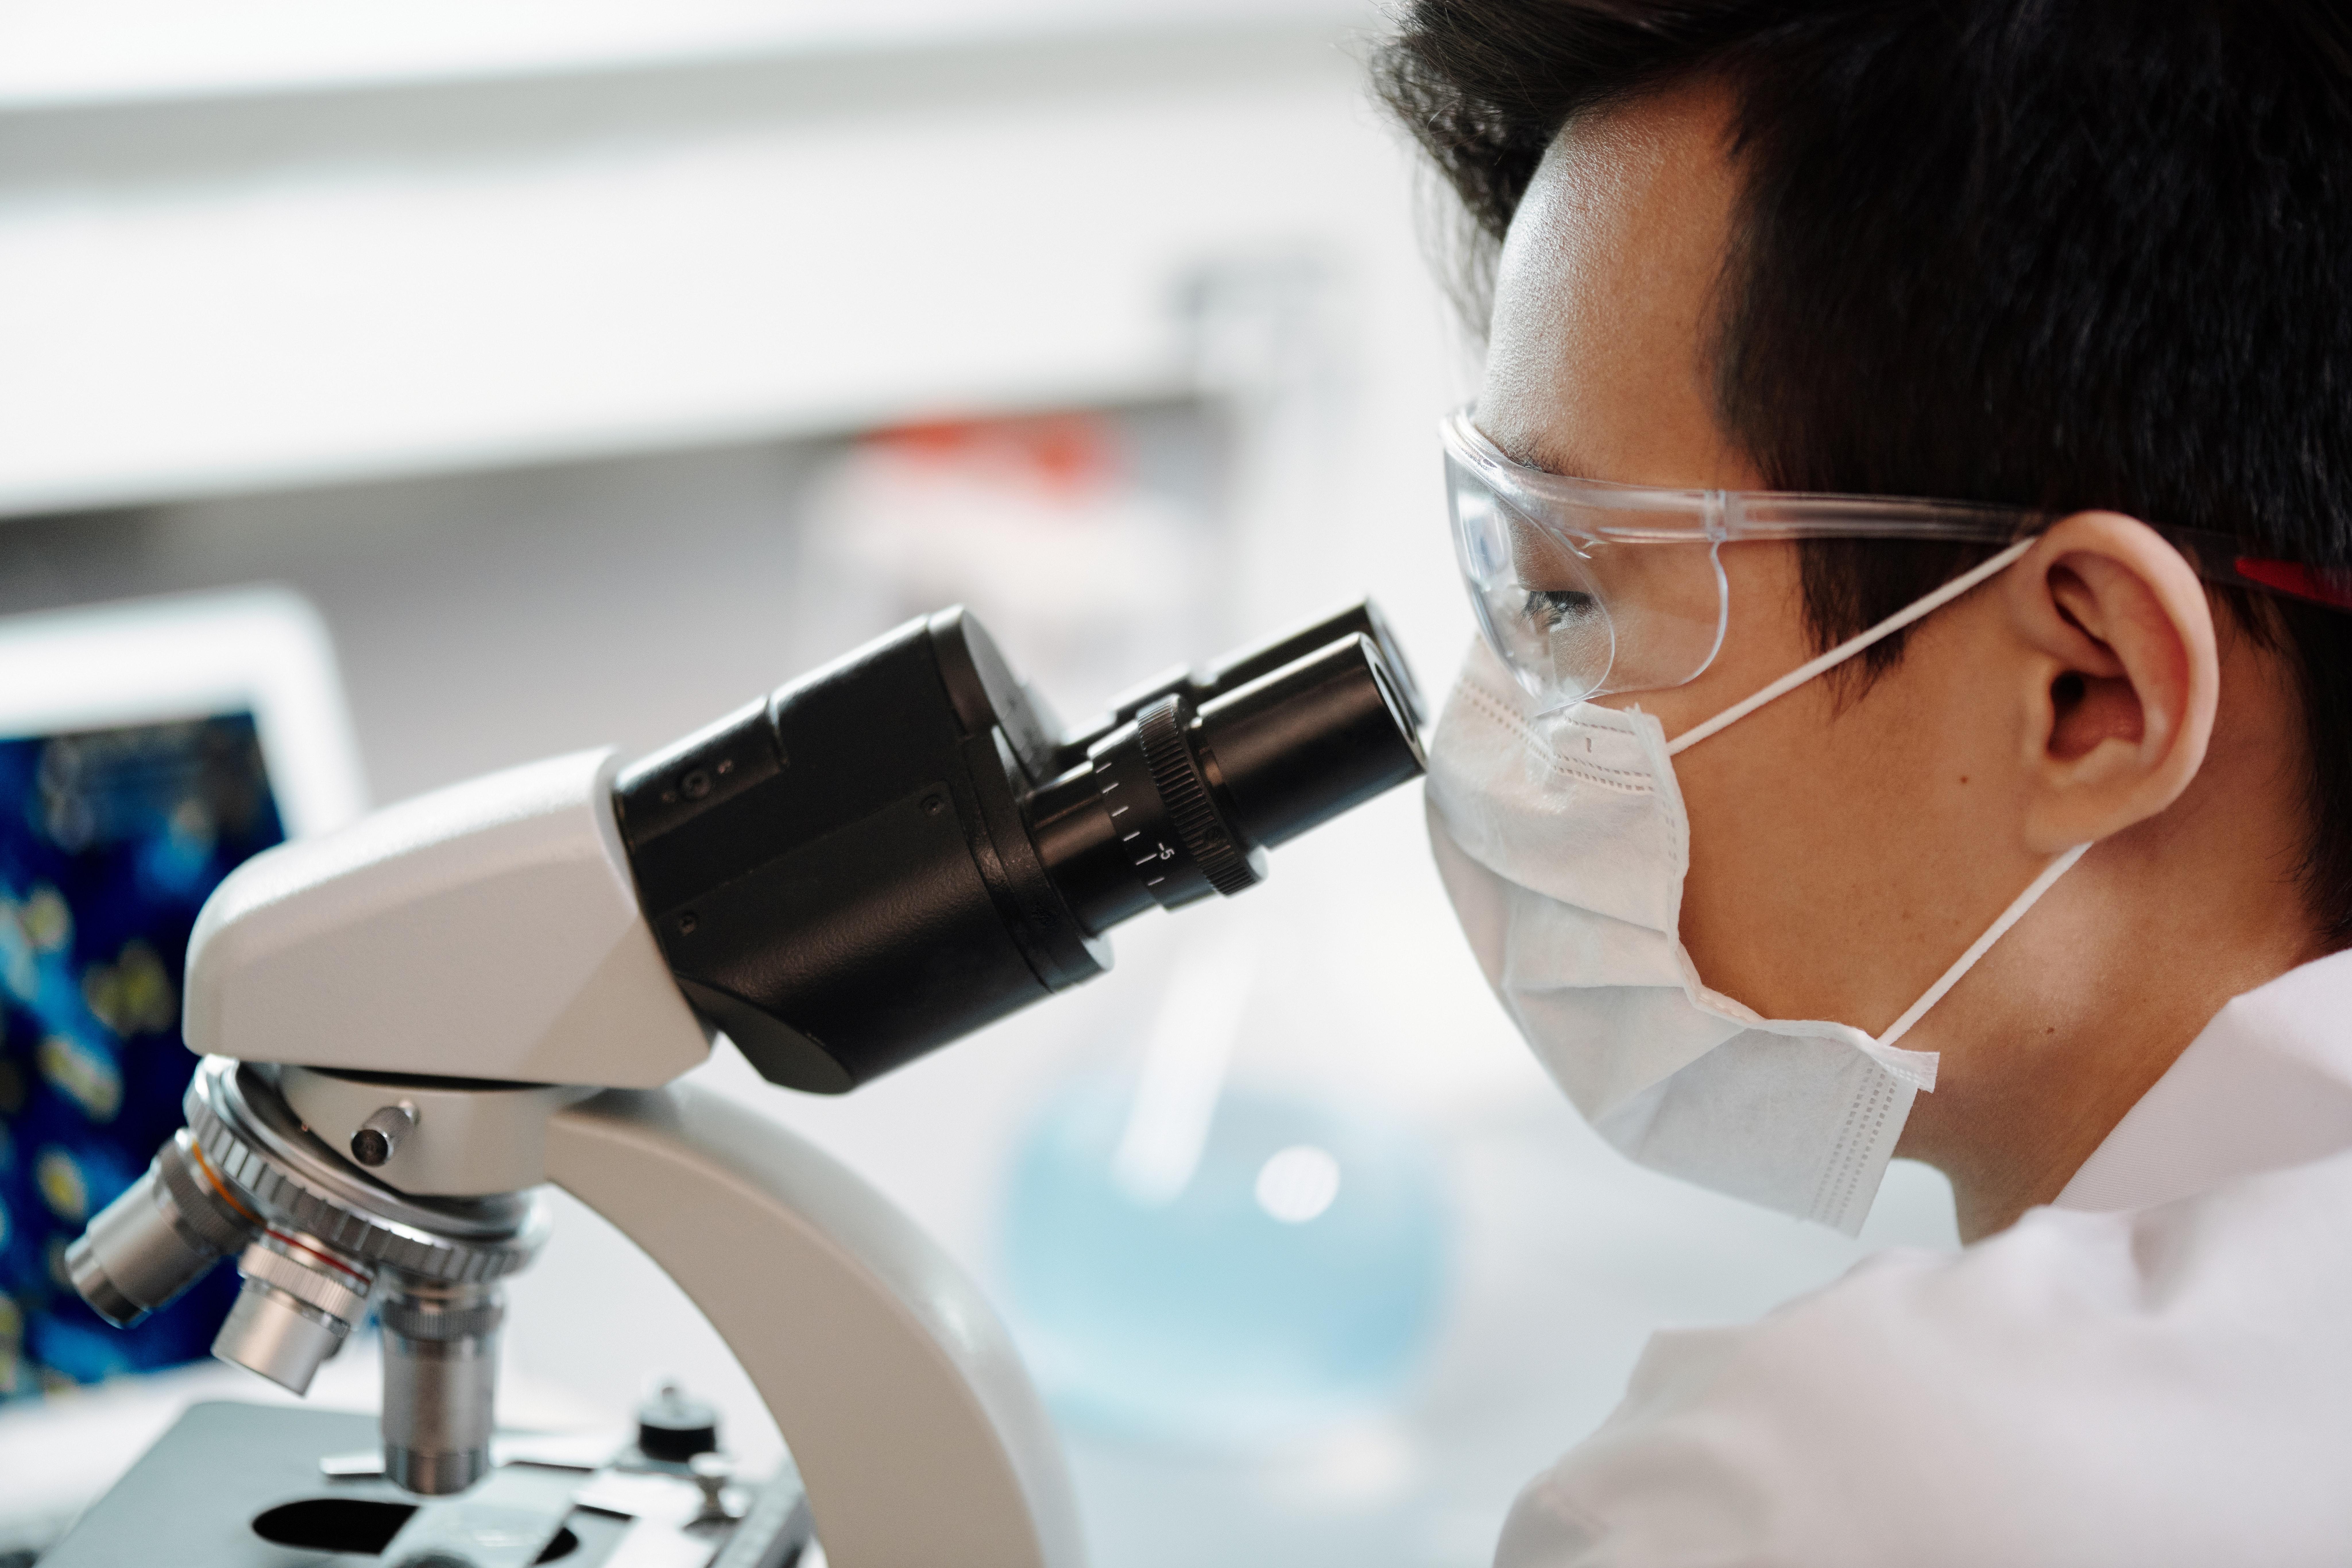 Scientist look into microscope